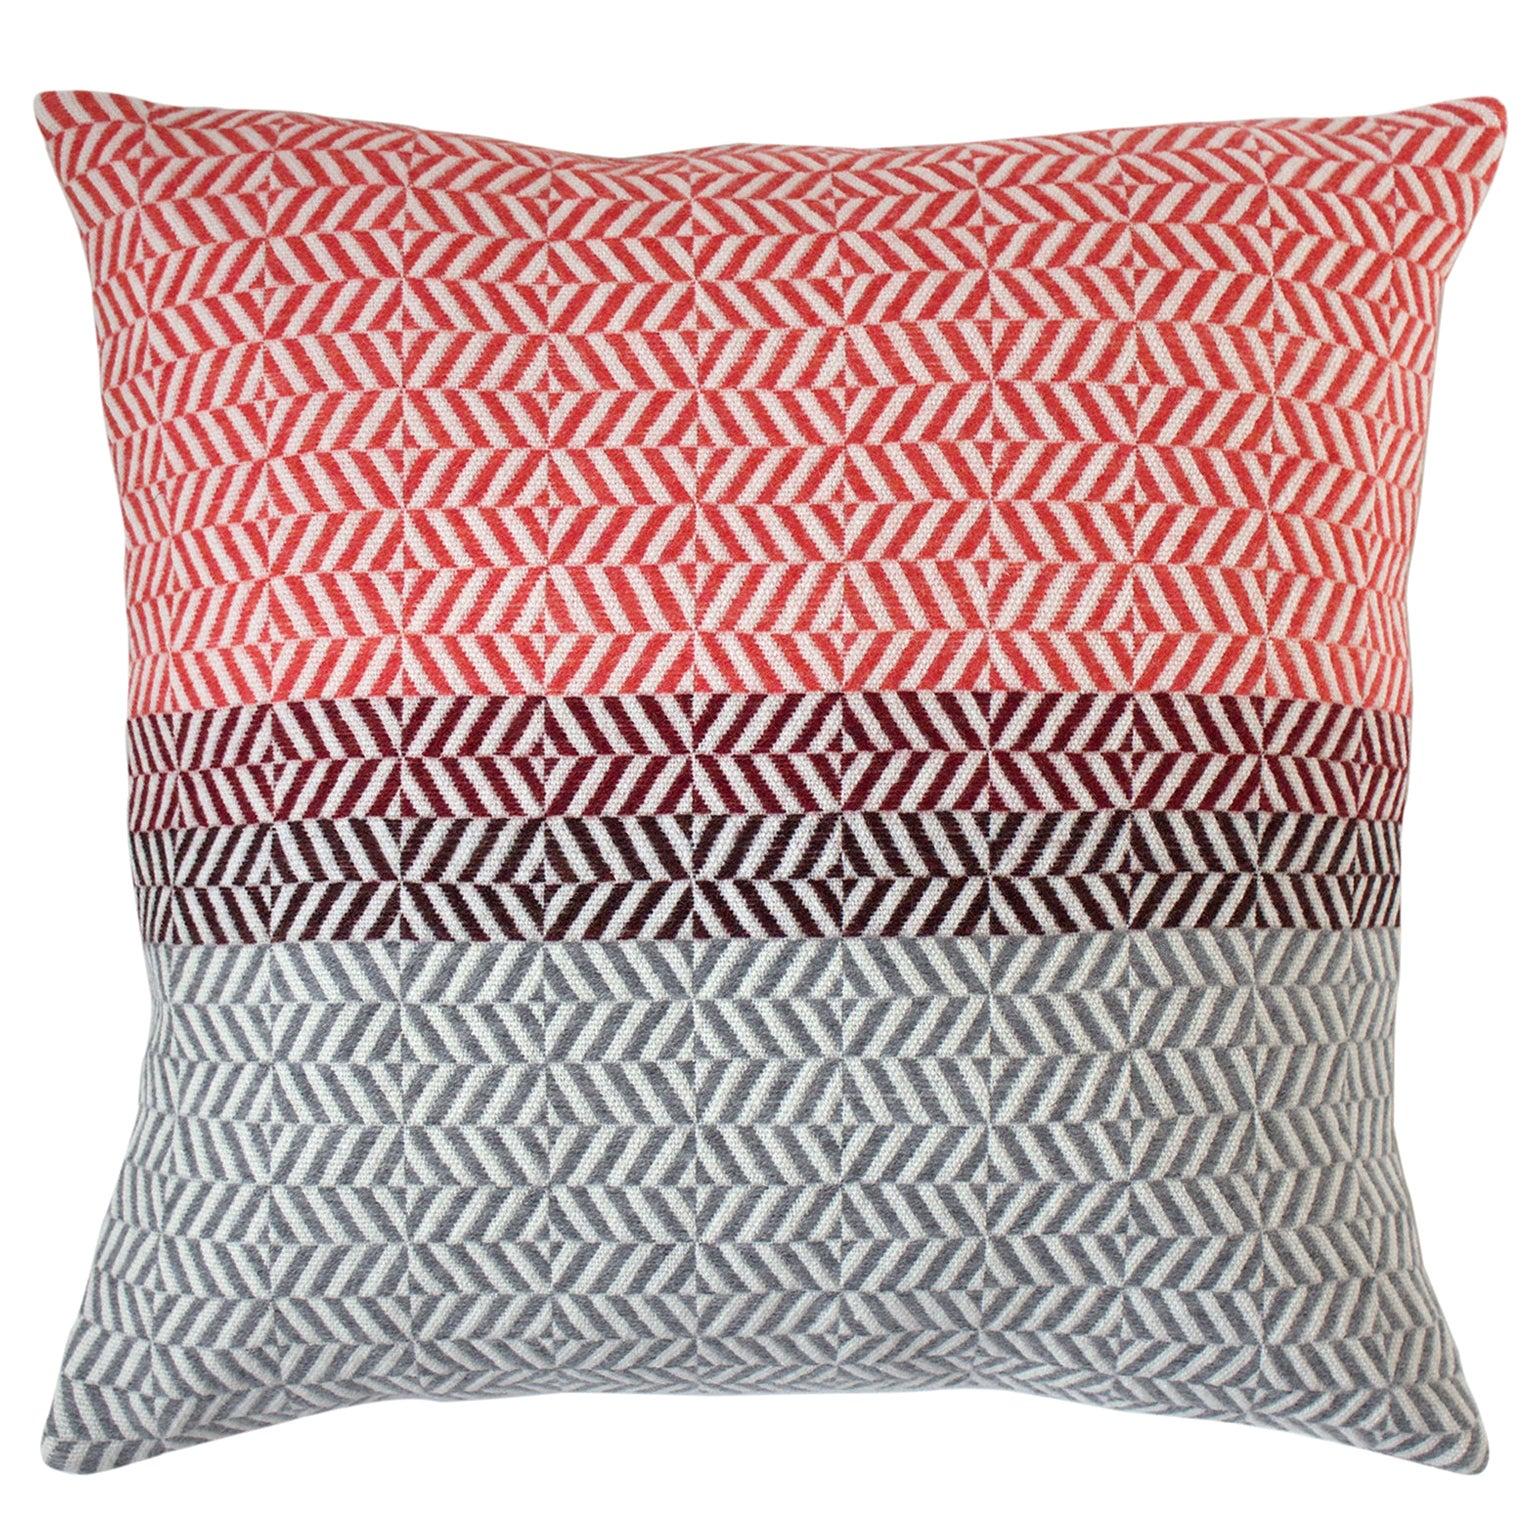 Handwoven 'Uccle' Block Geometric Merino Wool Cushion Pillow, Papaya/Red/Grey